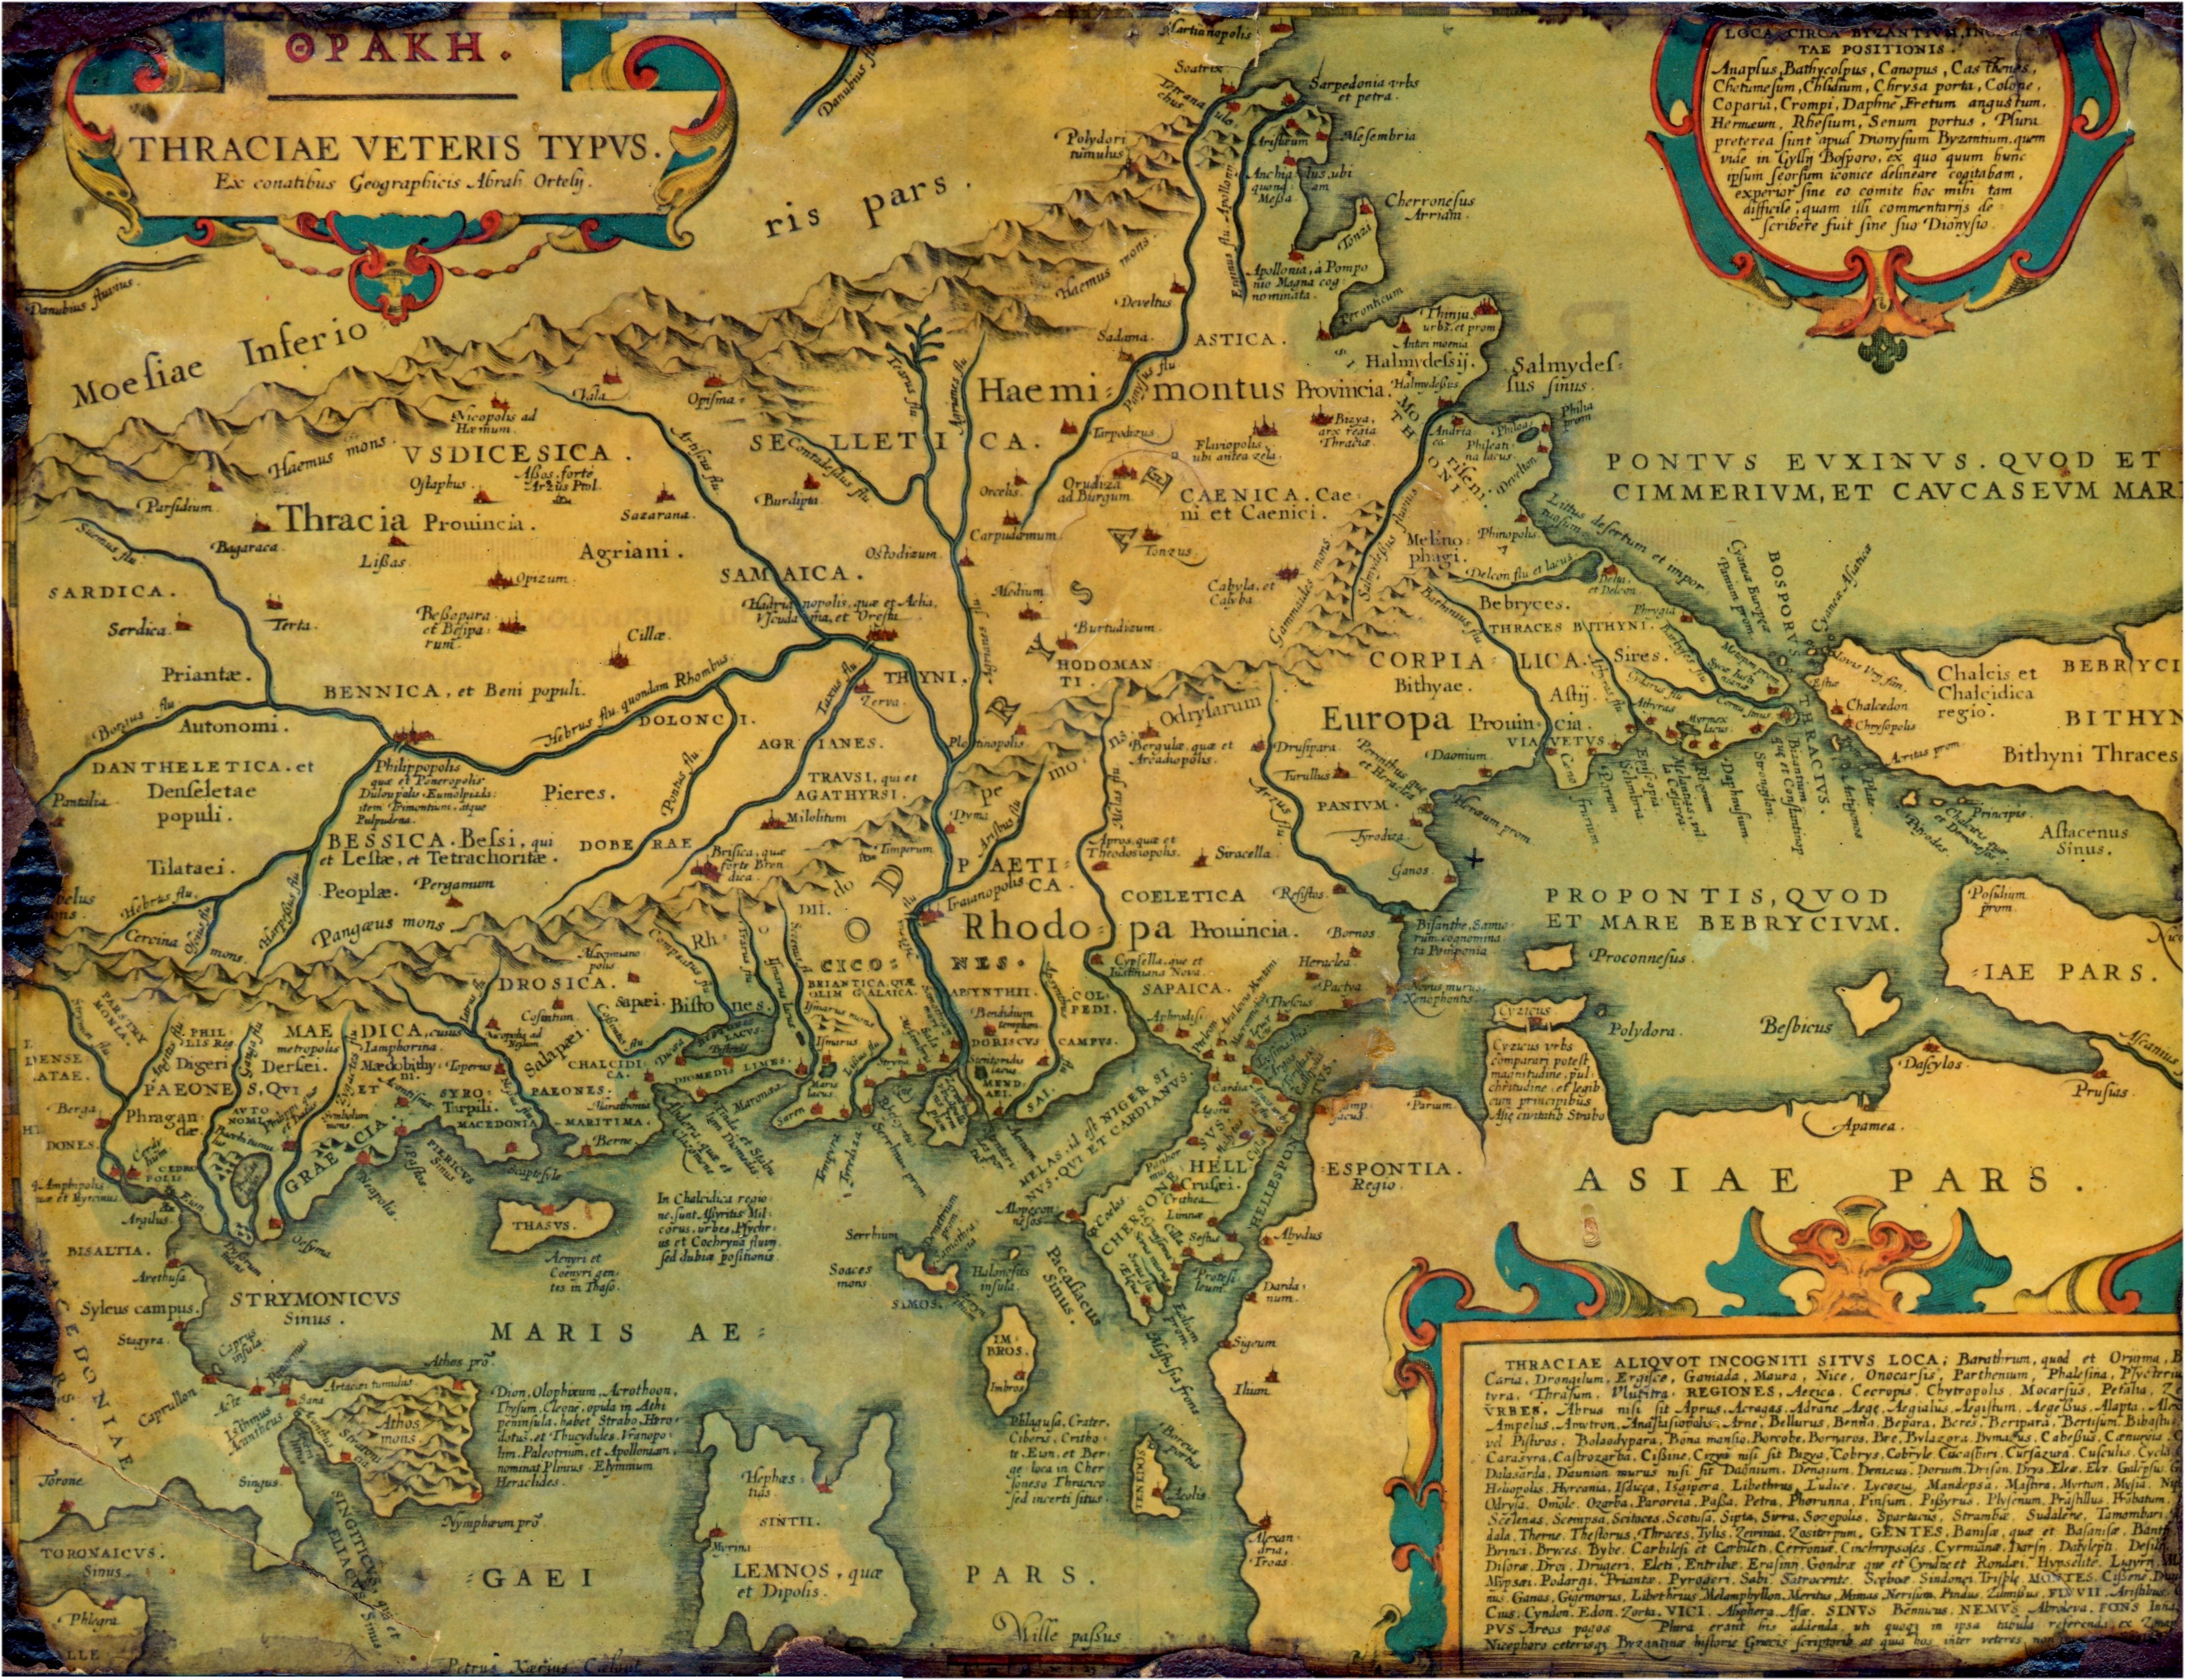 Mapa de la antigua Tracia, realizado en 1585.